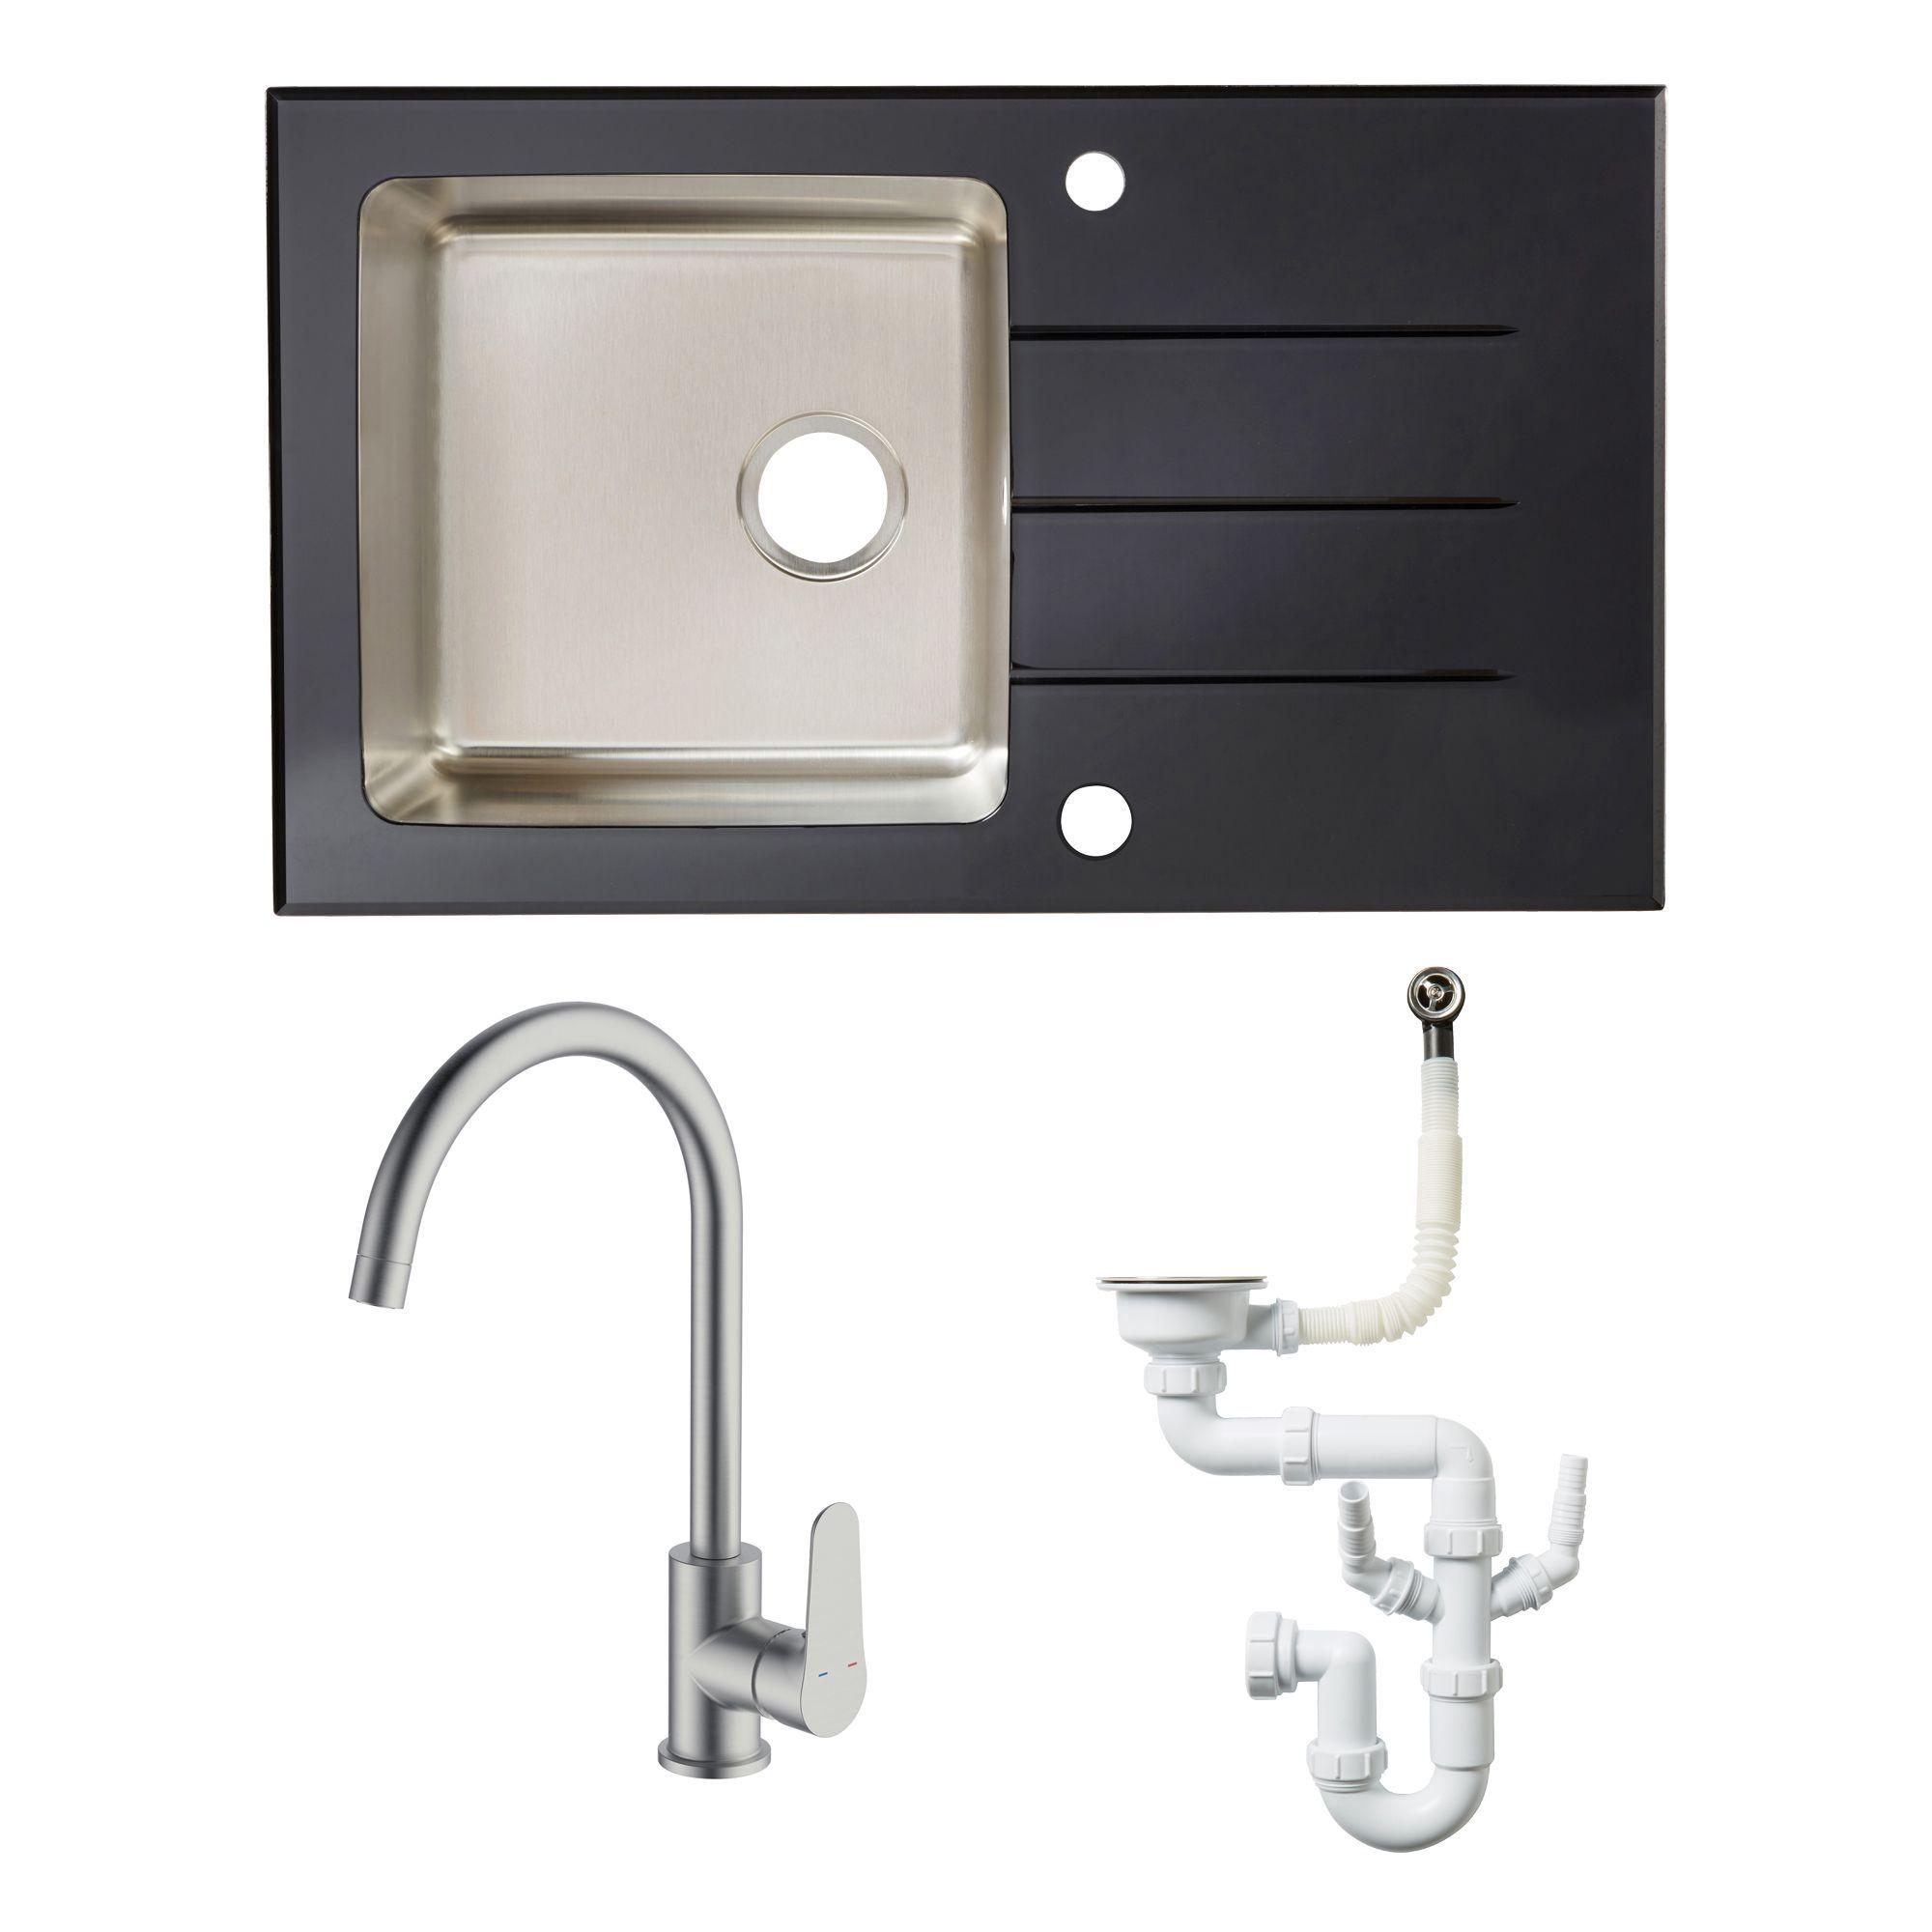 Cooke & Lewis 1 Bowl Black Stainless Steel & Toughened Glass Sink, Tap & Waste Kit